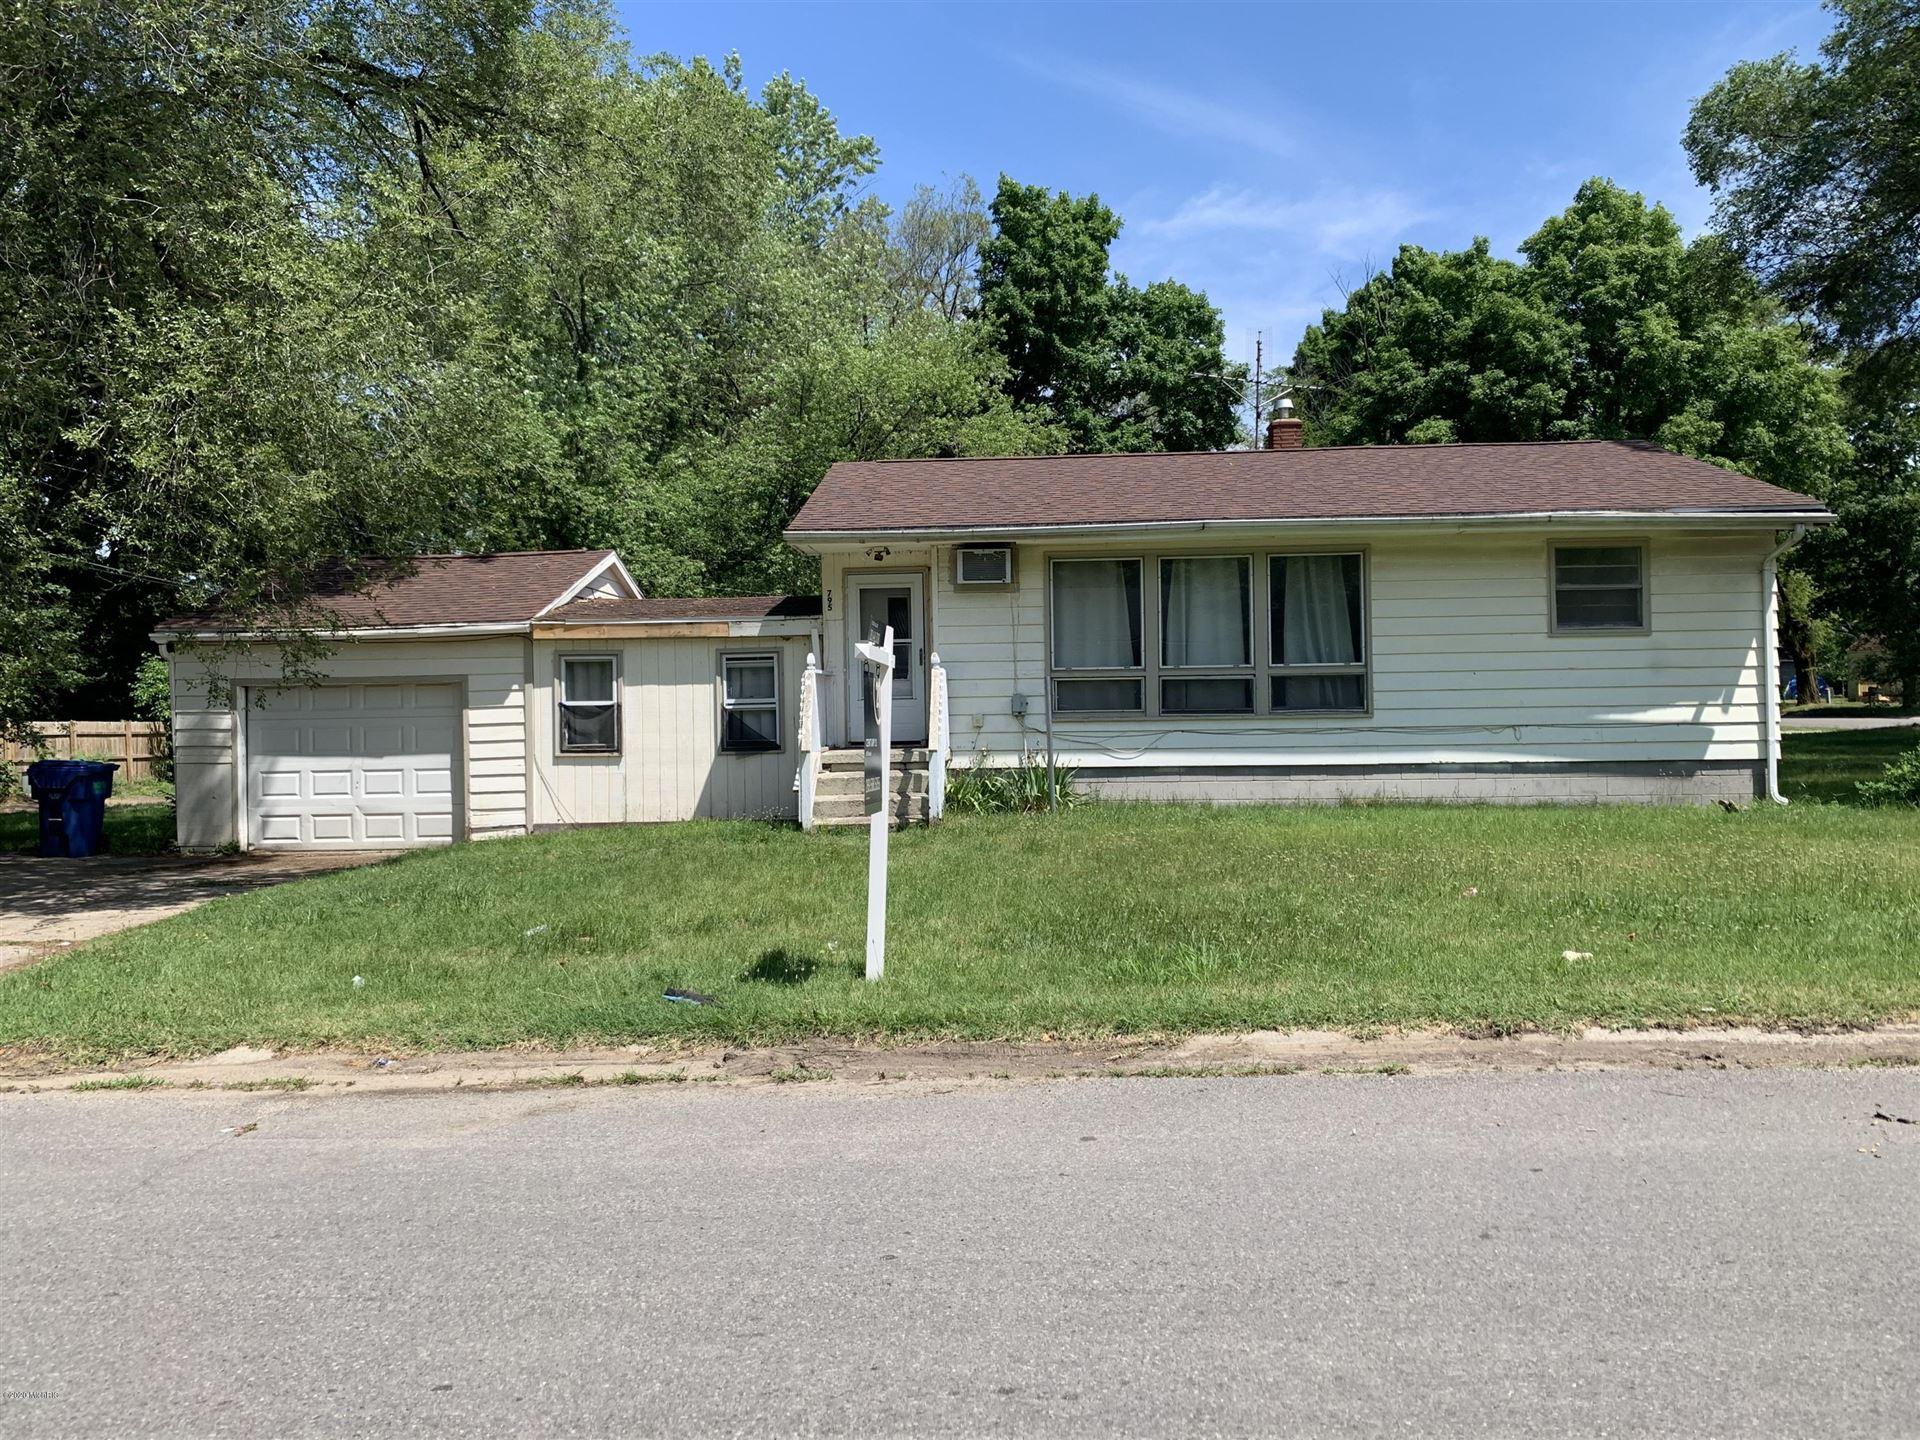 795 Donald Adkins Drive, Benton Harbor, MI 49022 - #: 20024621